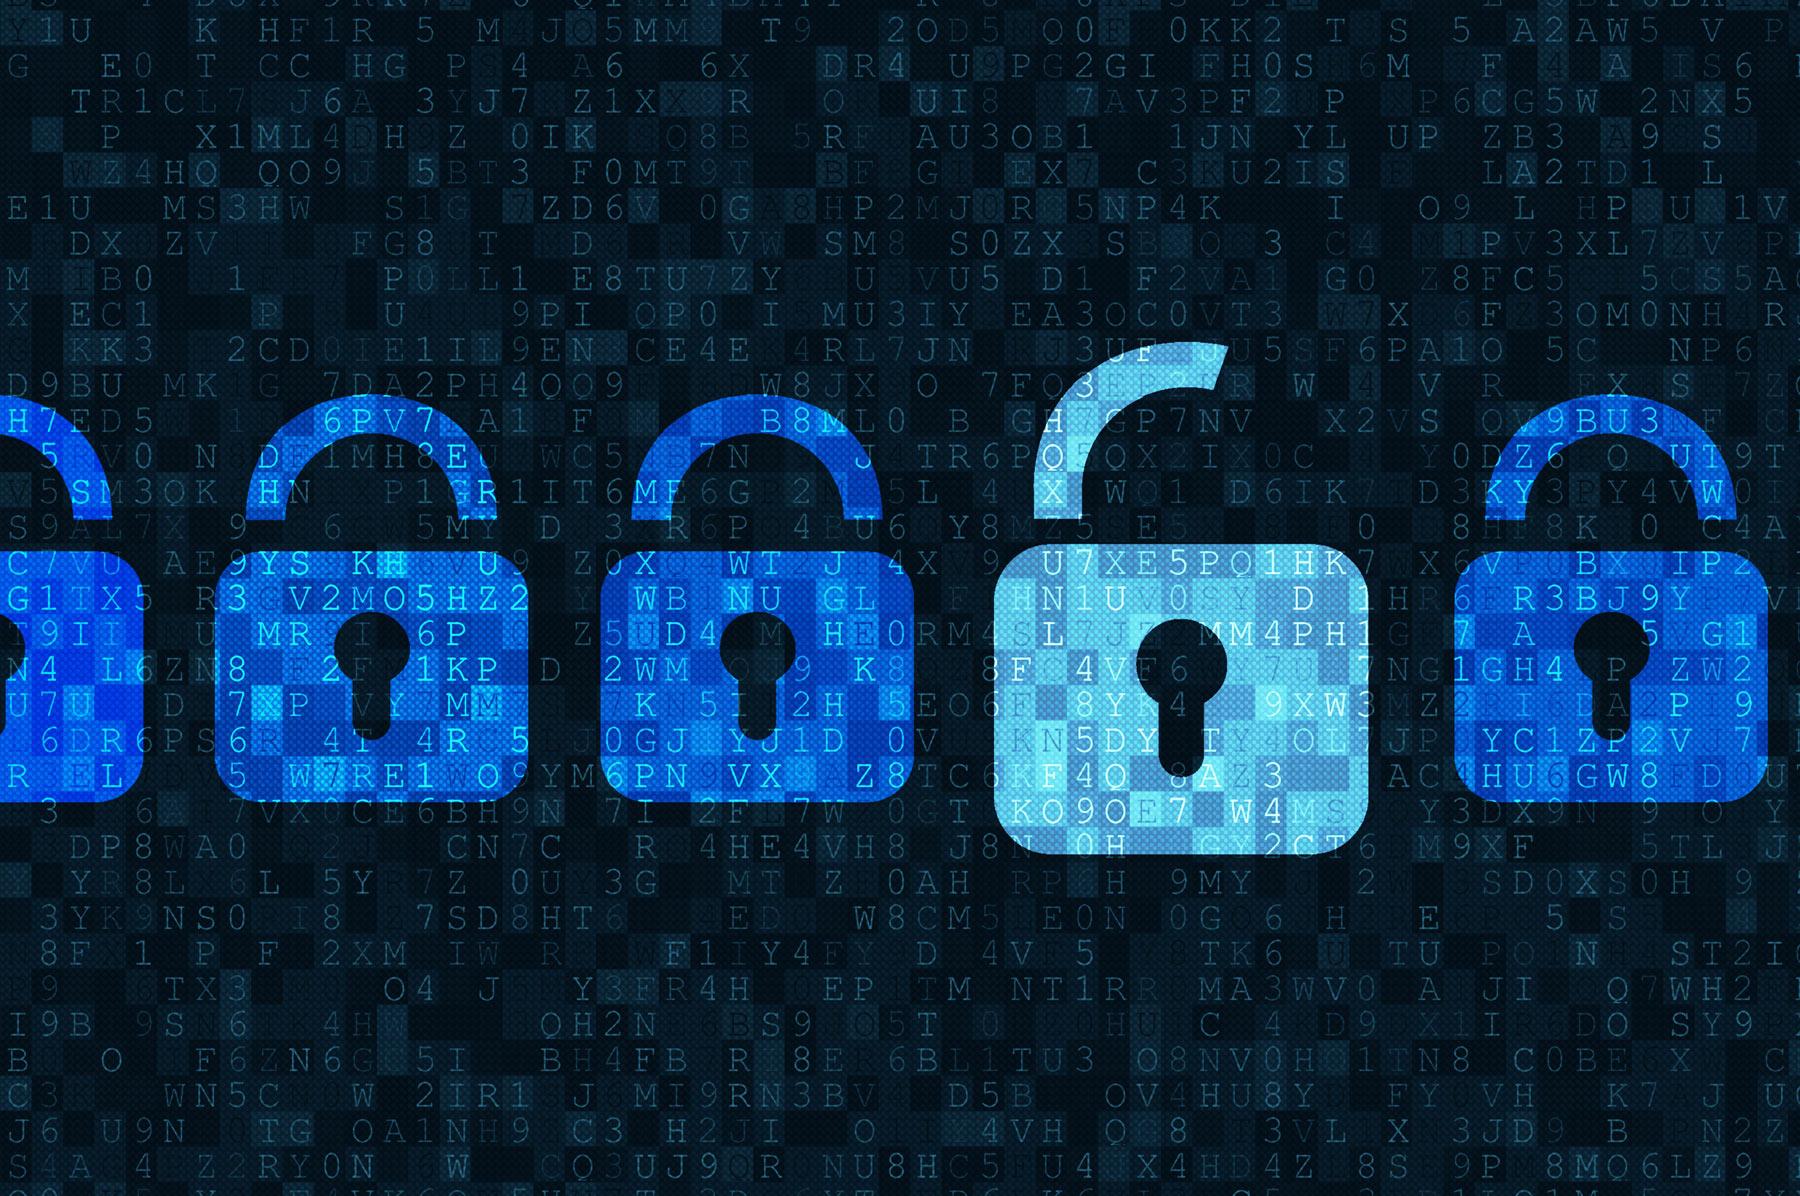 web updates kmu GmbH-wuk-WordPress und SEO Agentur service security